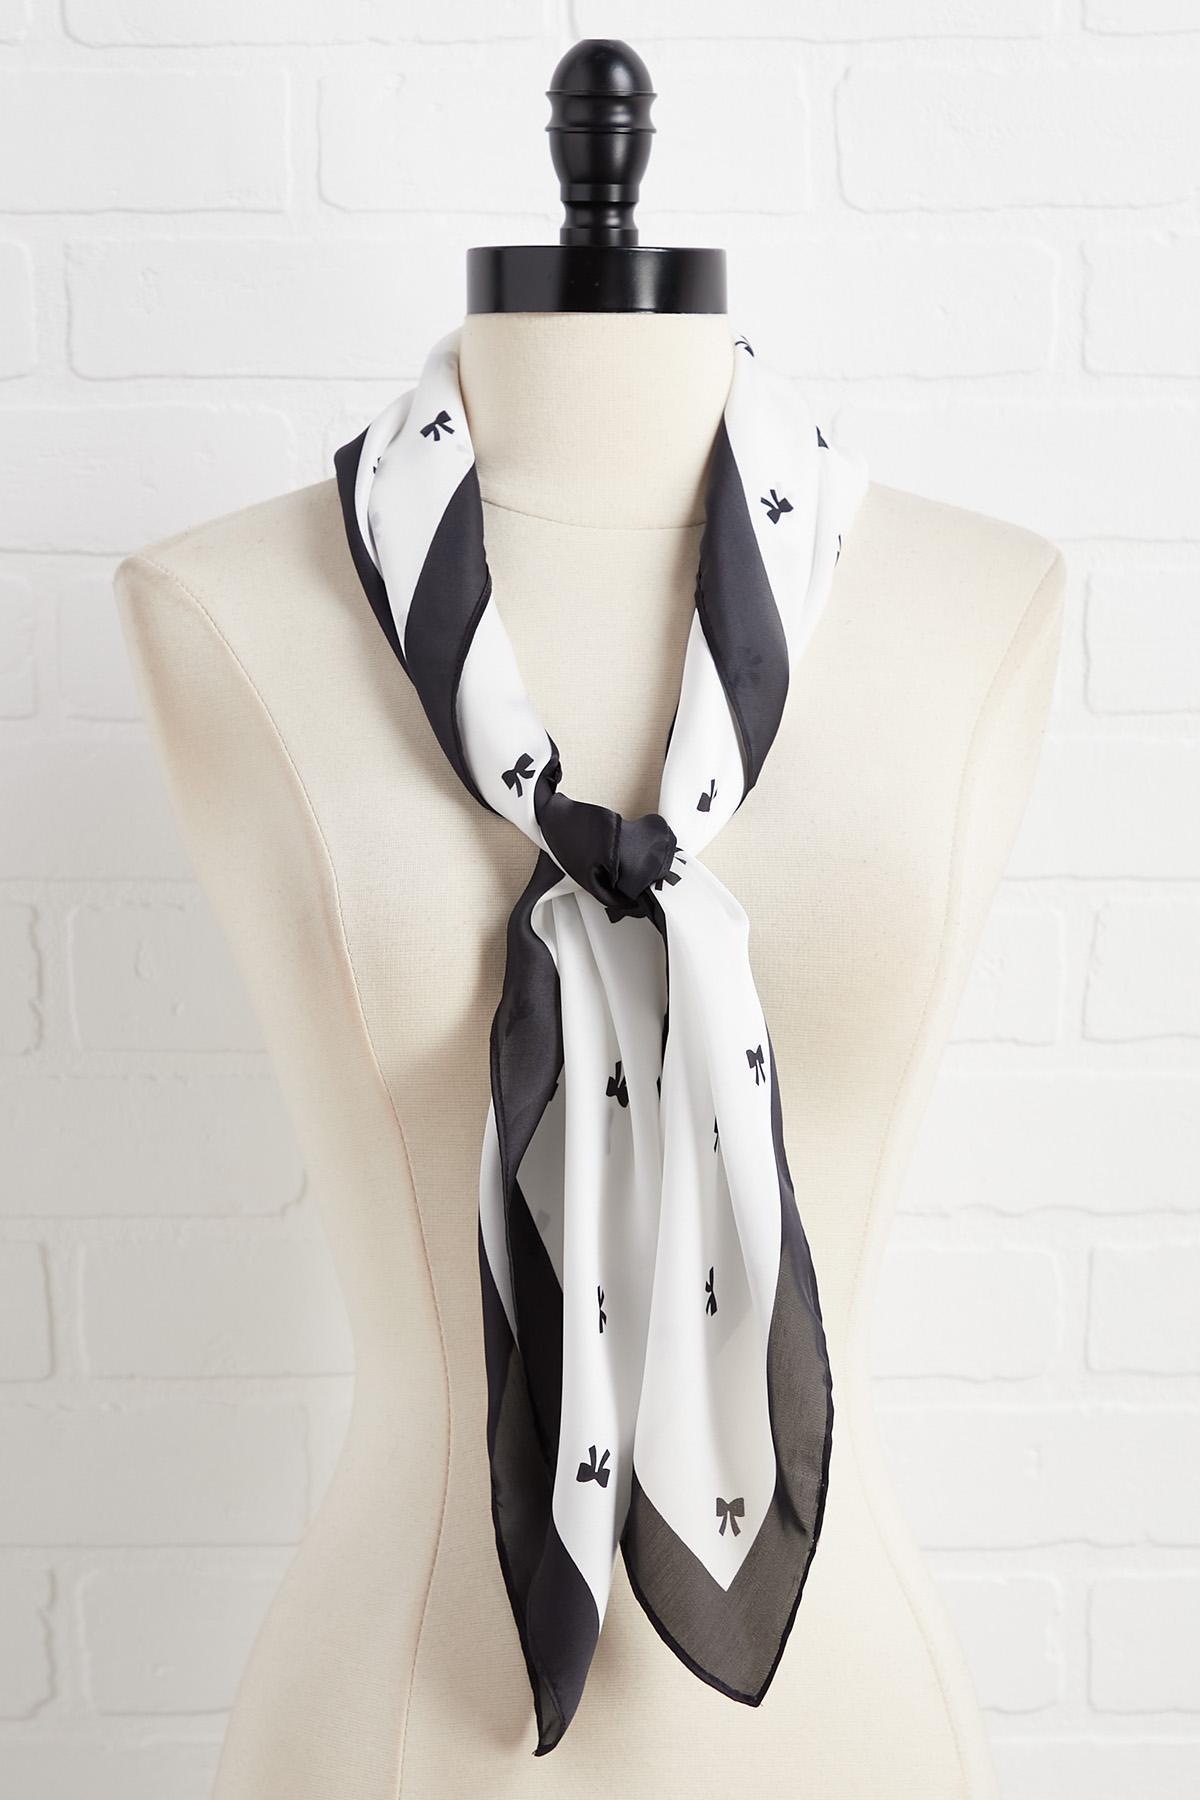 Black And White Bow Neckerchief